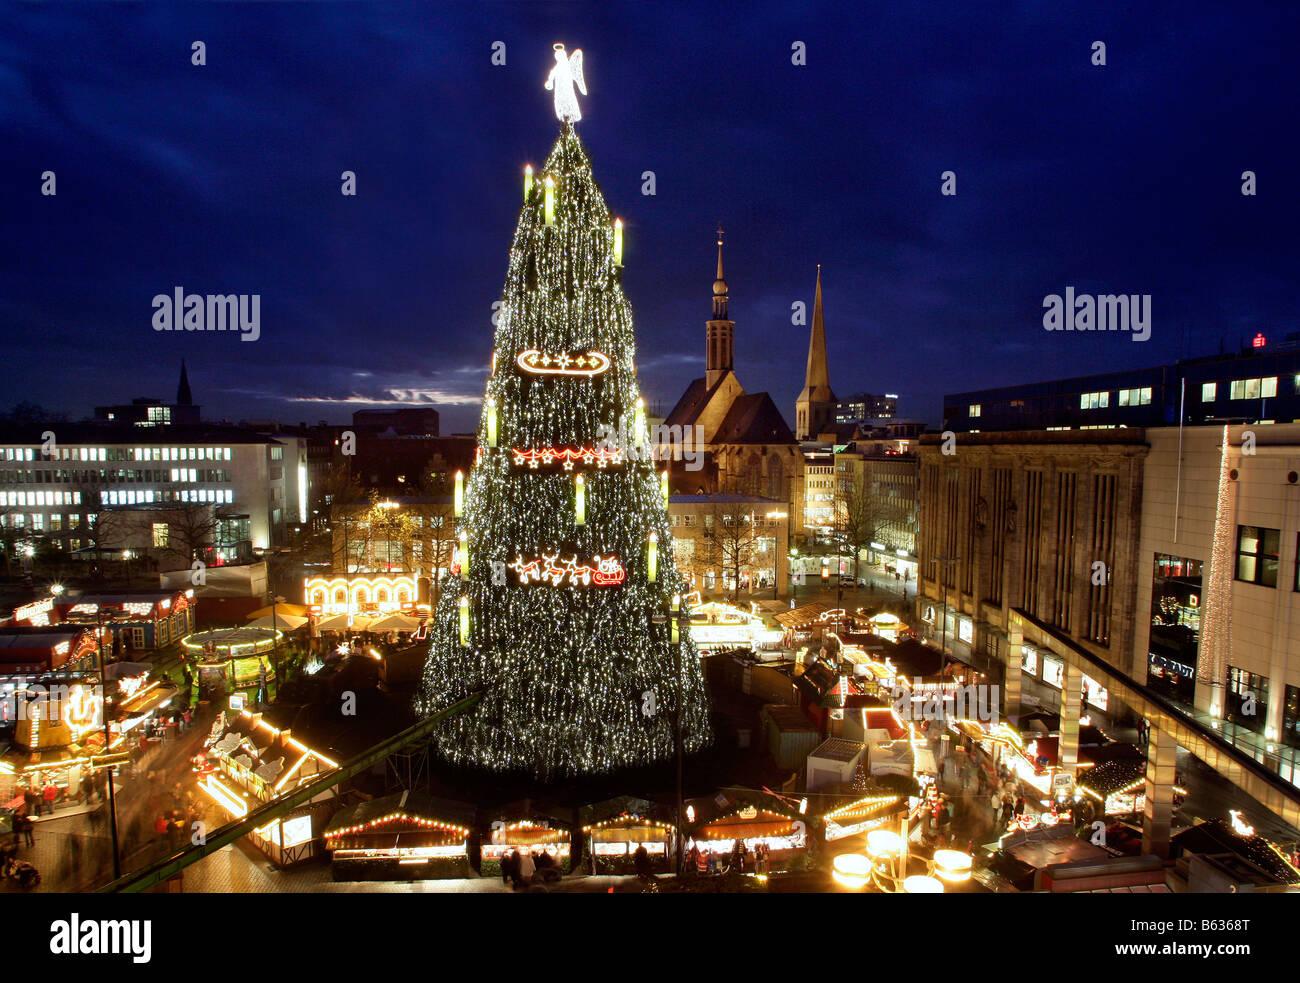 Dortmund/Germany: The World Largest Christmas Tree Stock